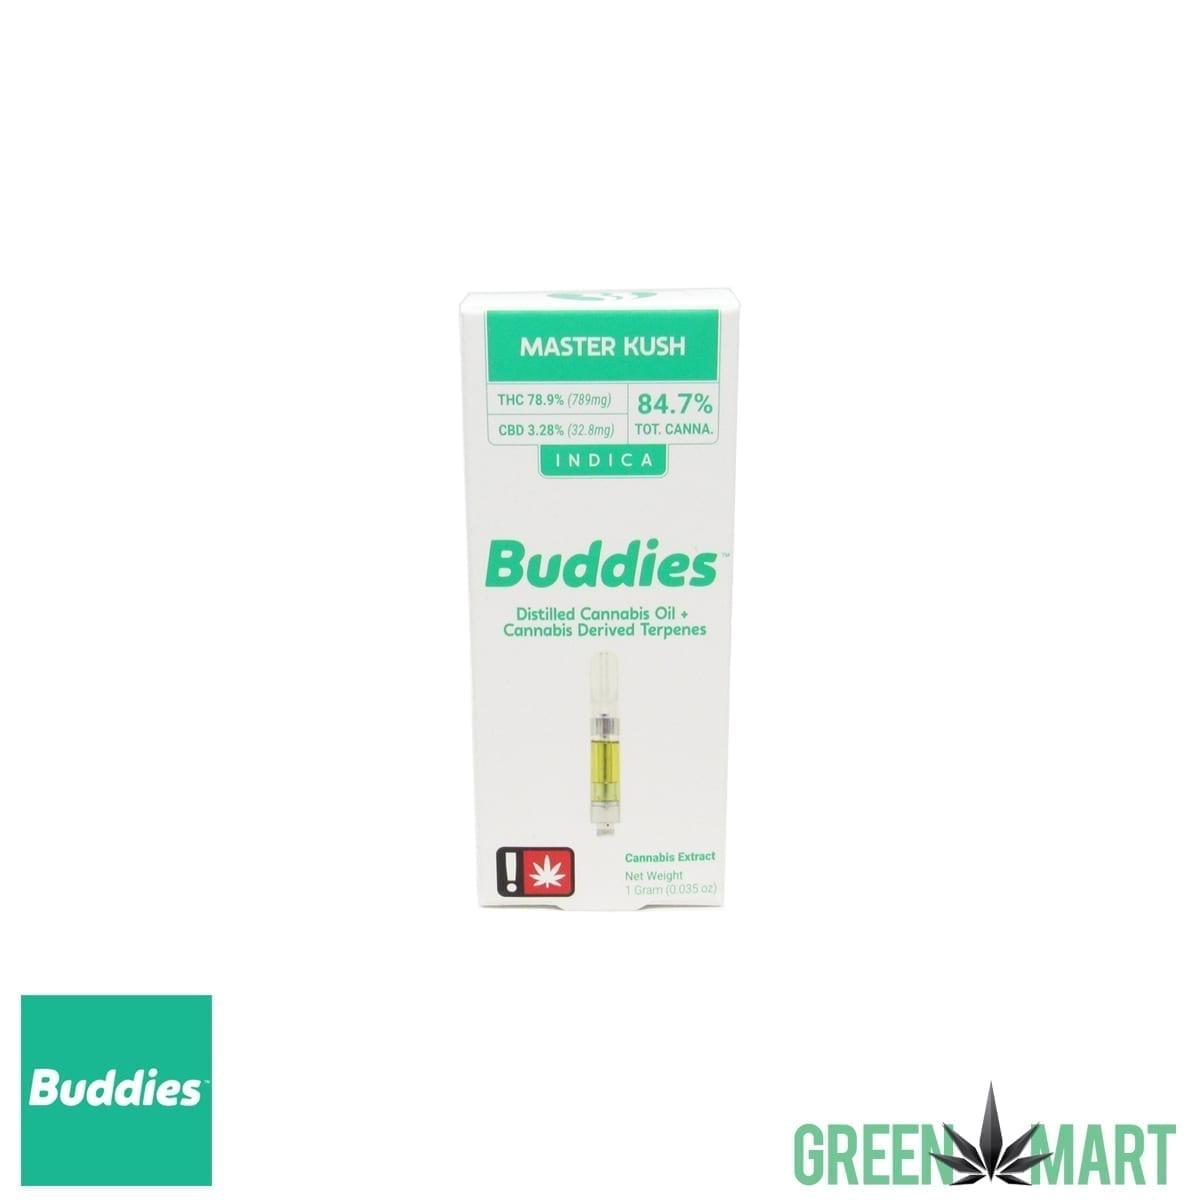 Buddies Brand Distillate Cartridge - Master Kush